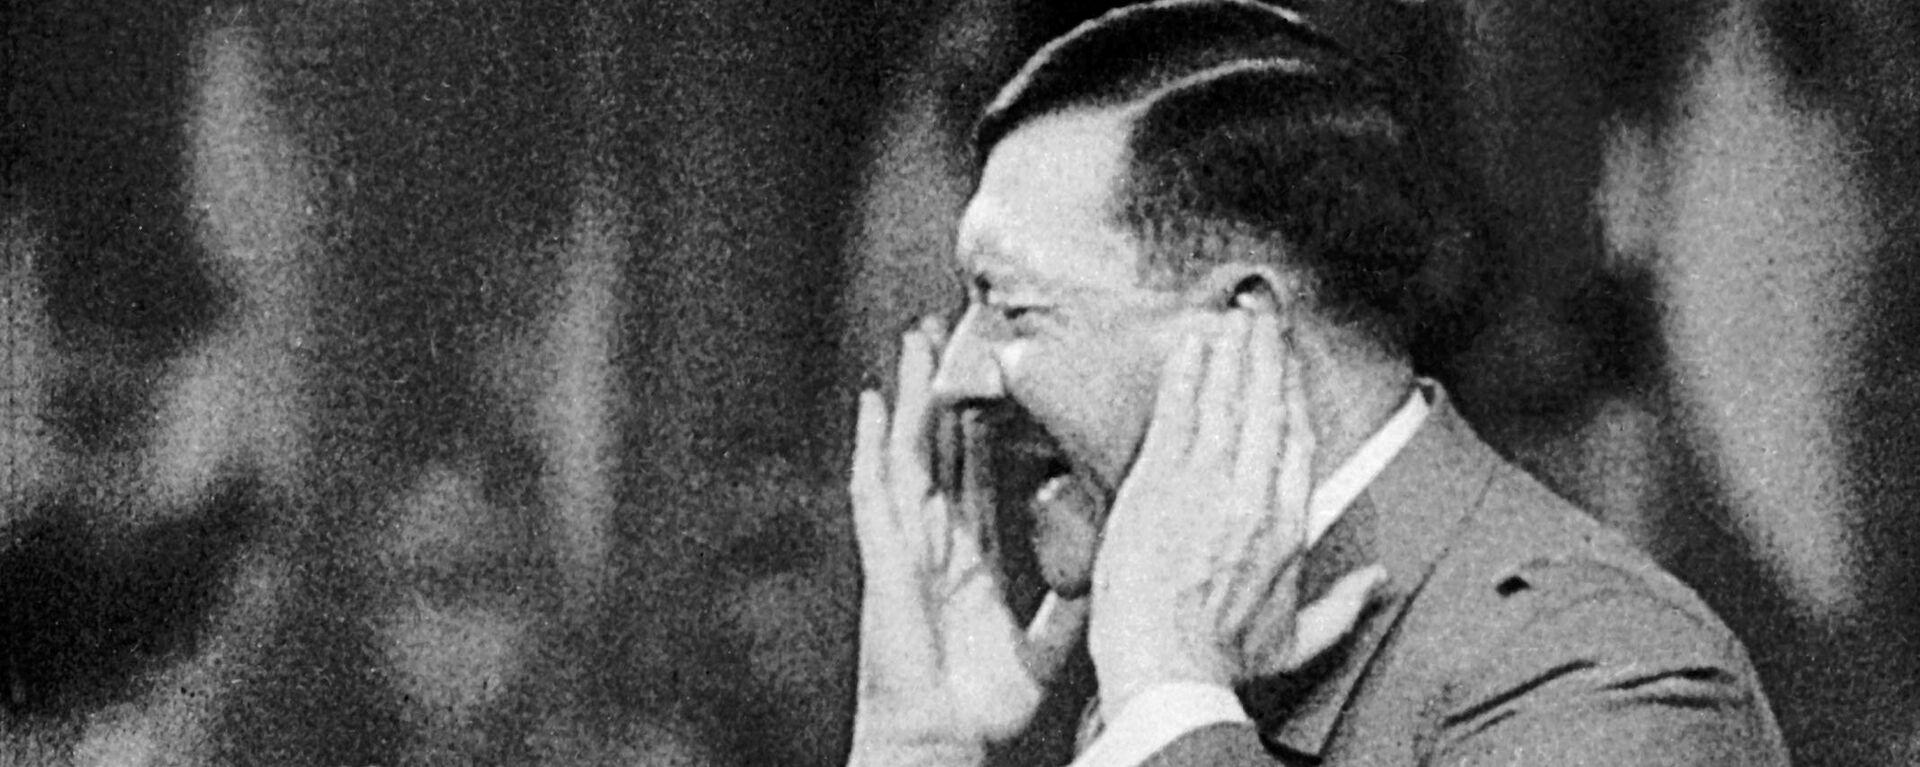 Adolf Hitler - Sputnik Mundo, 1920, 18.04.2020